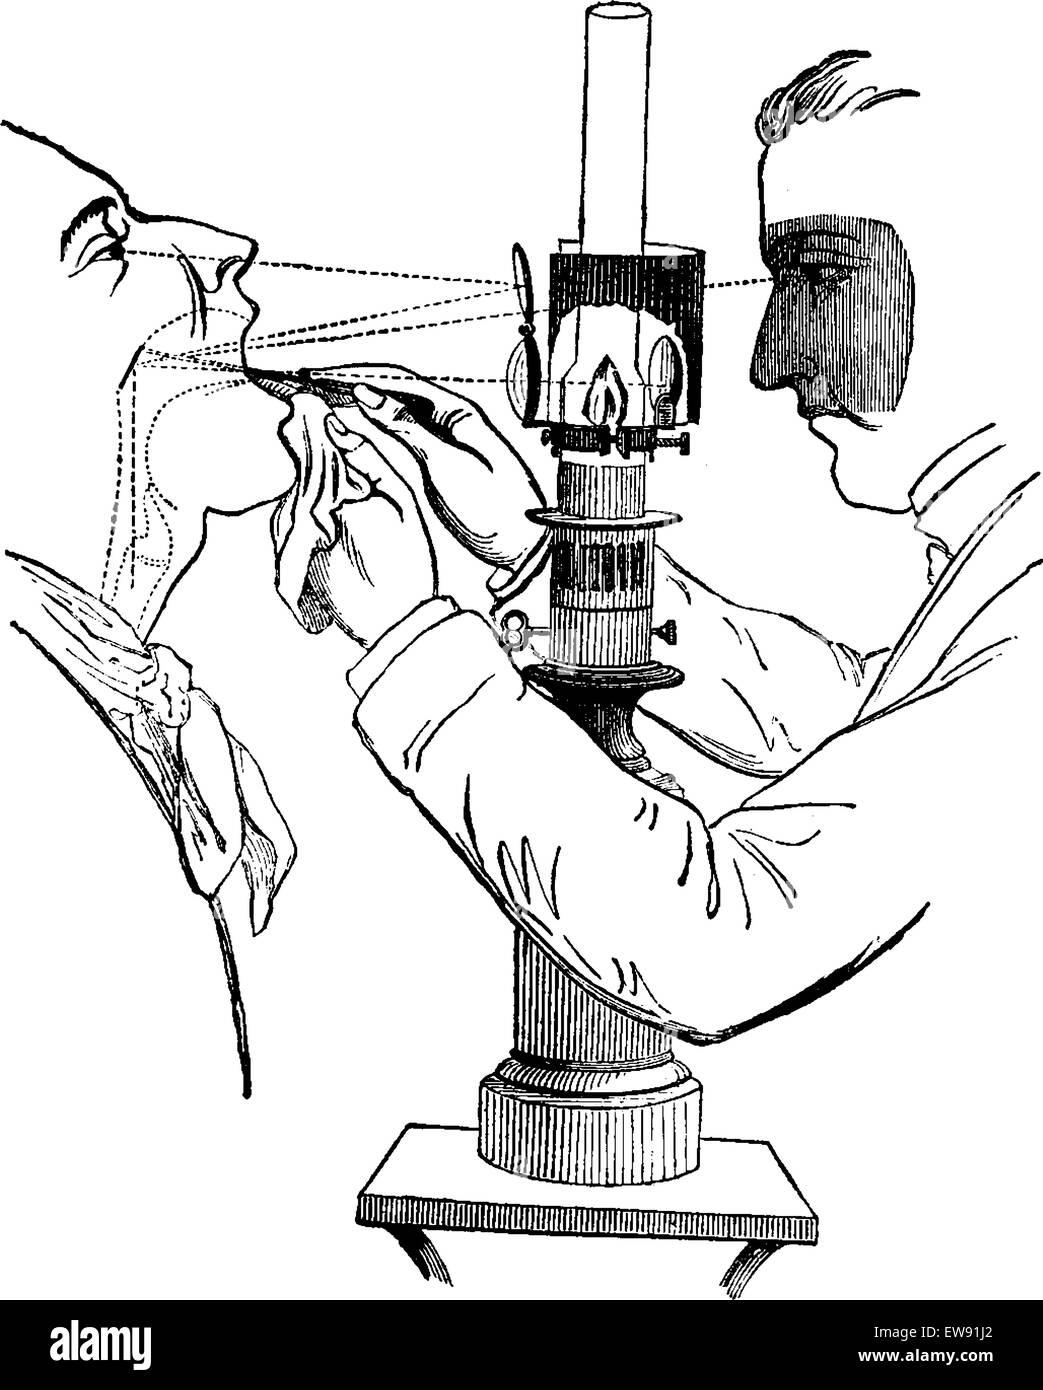 Laryngoscope Stock Photos & Laryngoscope Stock Images - Alamy